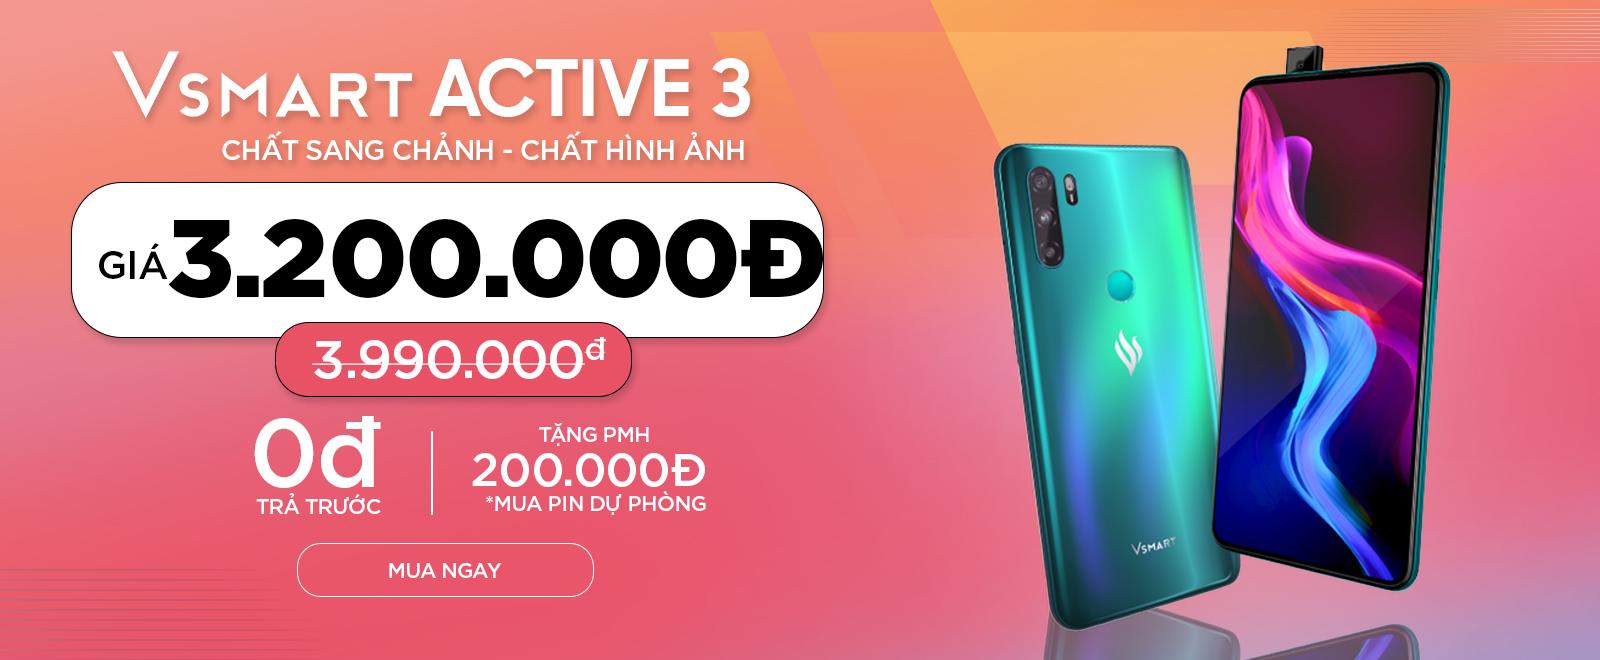 Vsmart Active 3 Chỉ 3.4 triệu